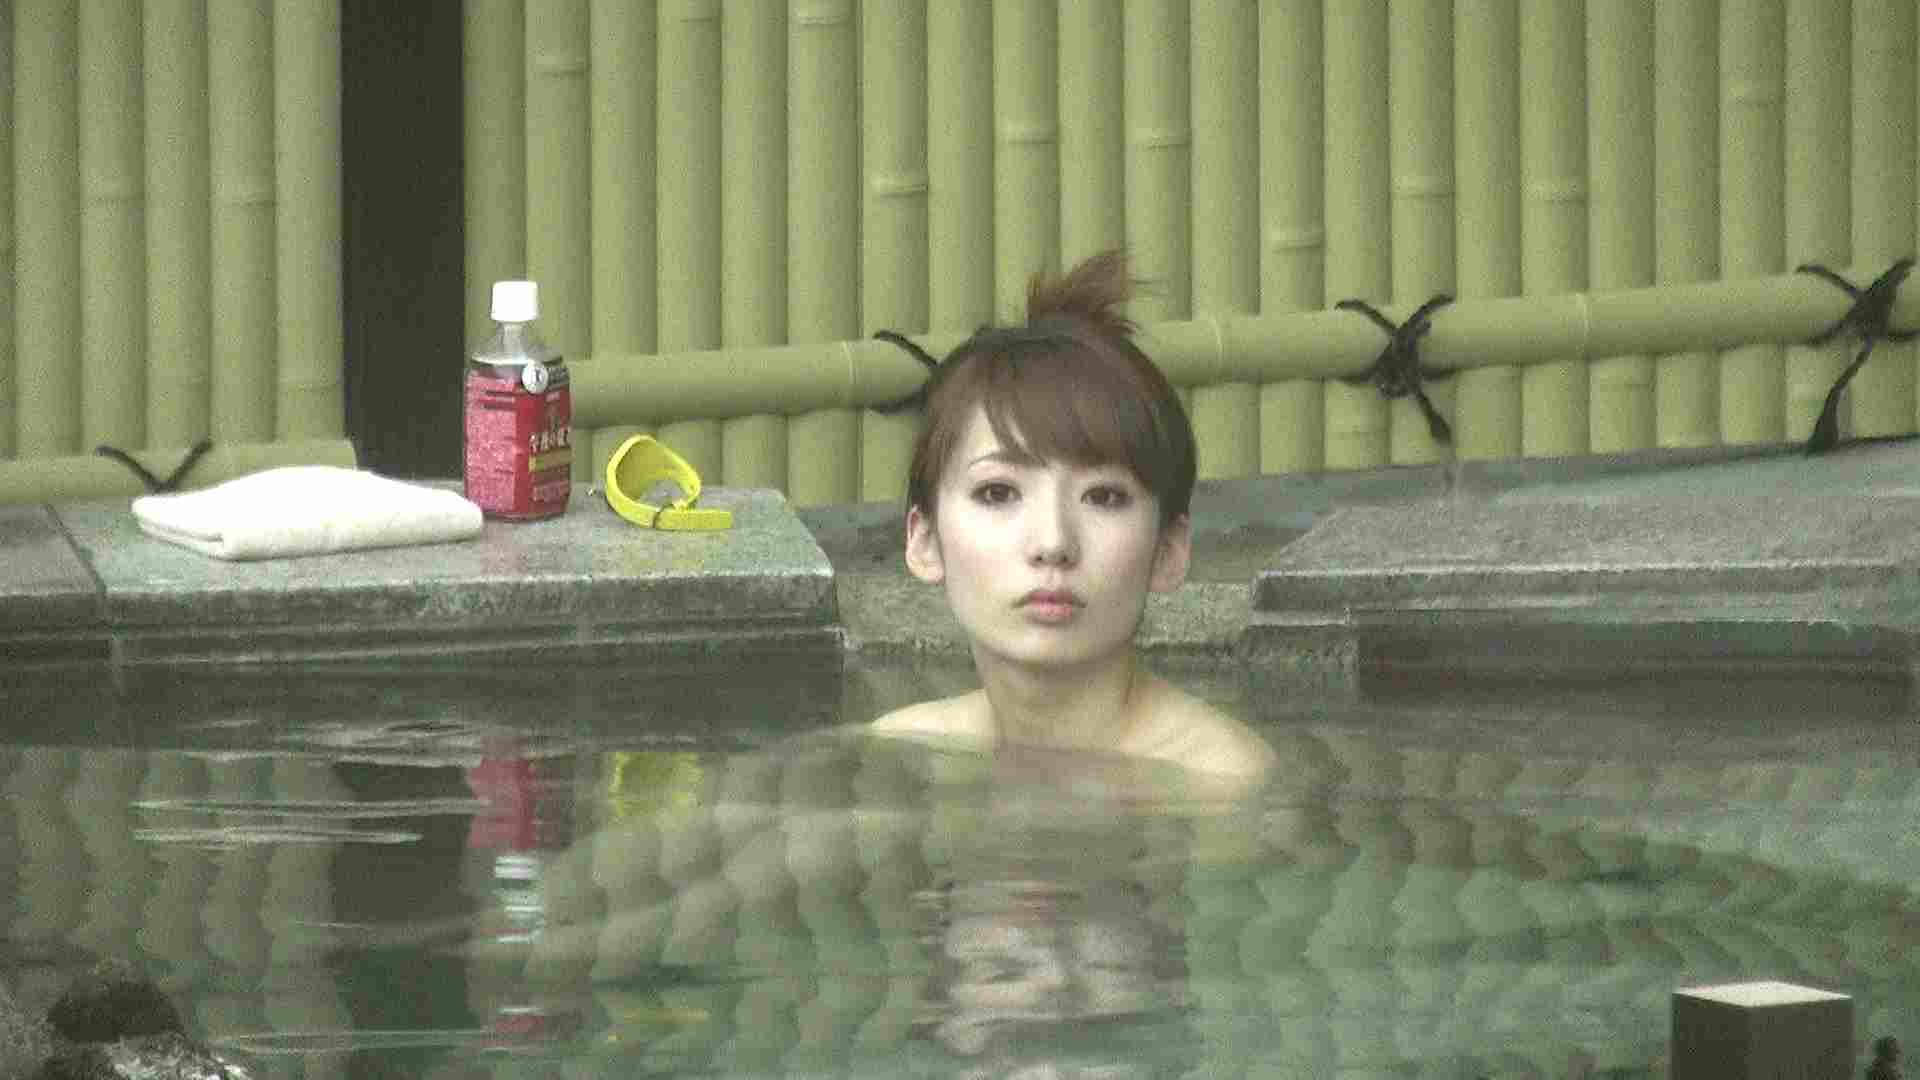 Aquaな露天風呂Vol.208 0 | 0  78連発 25